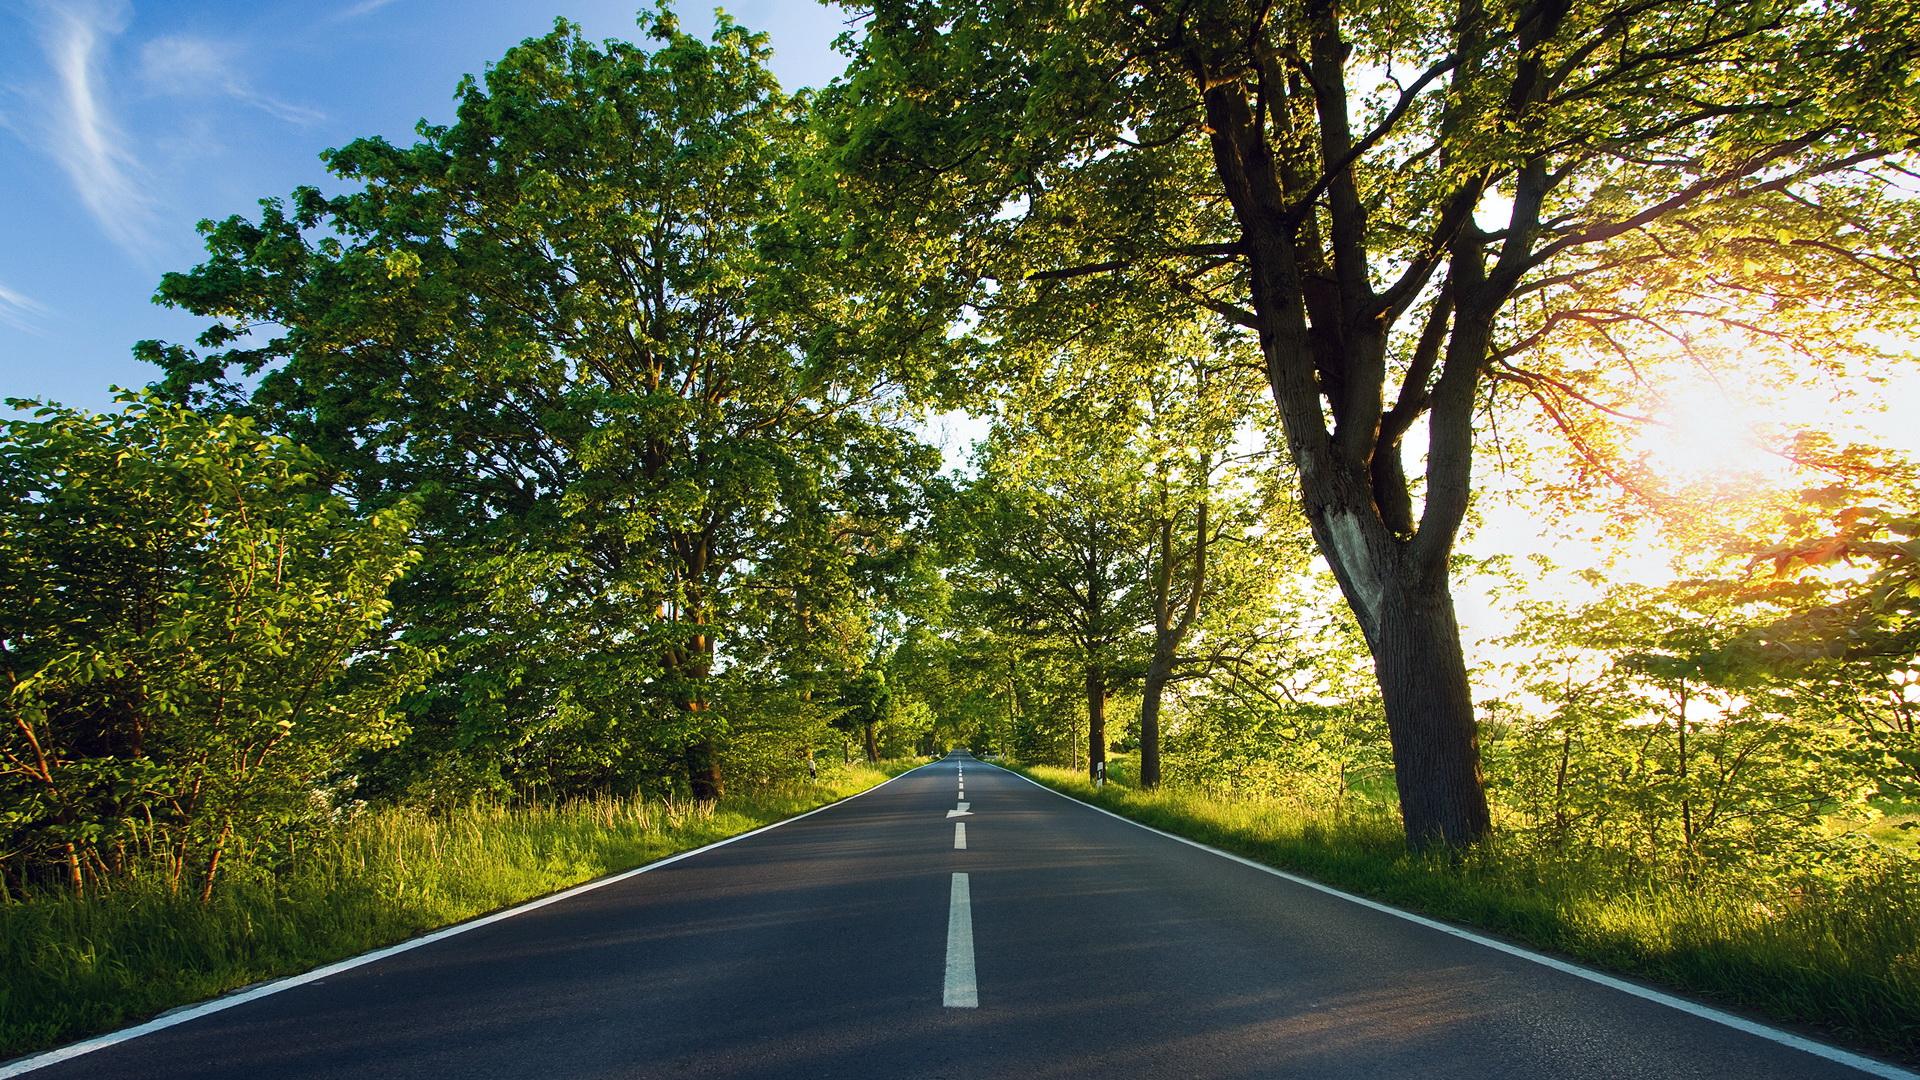 Beautiful-spring-road-wallpapers-1920x1080.jpg